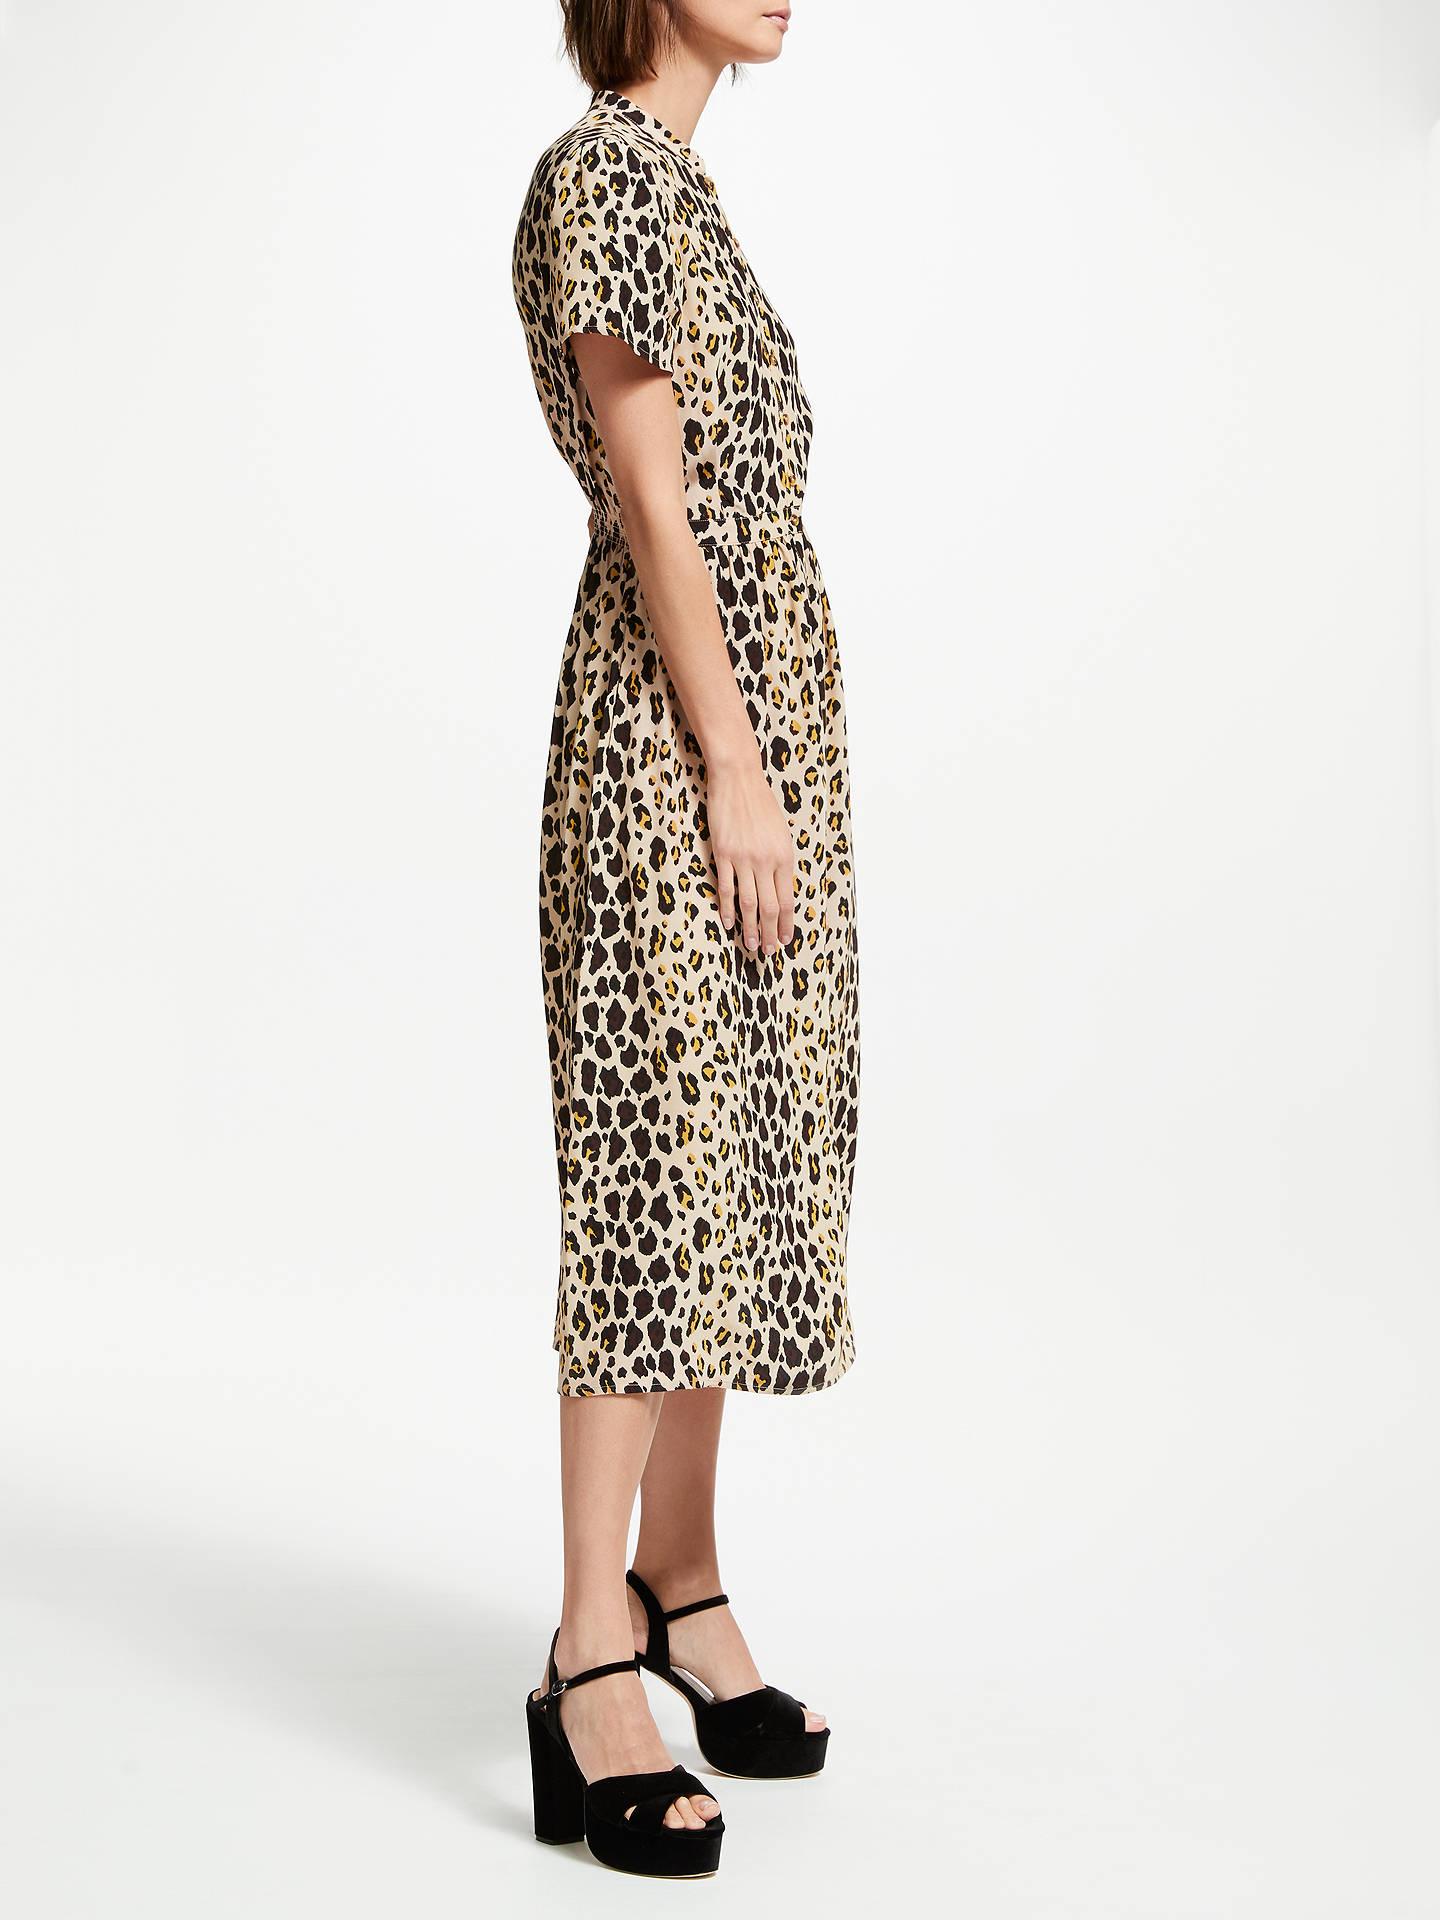 b3b9128dd8 BuySomerset by Alice Temperley Leopard Print Shirt Dress